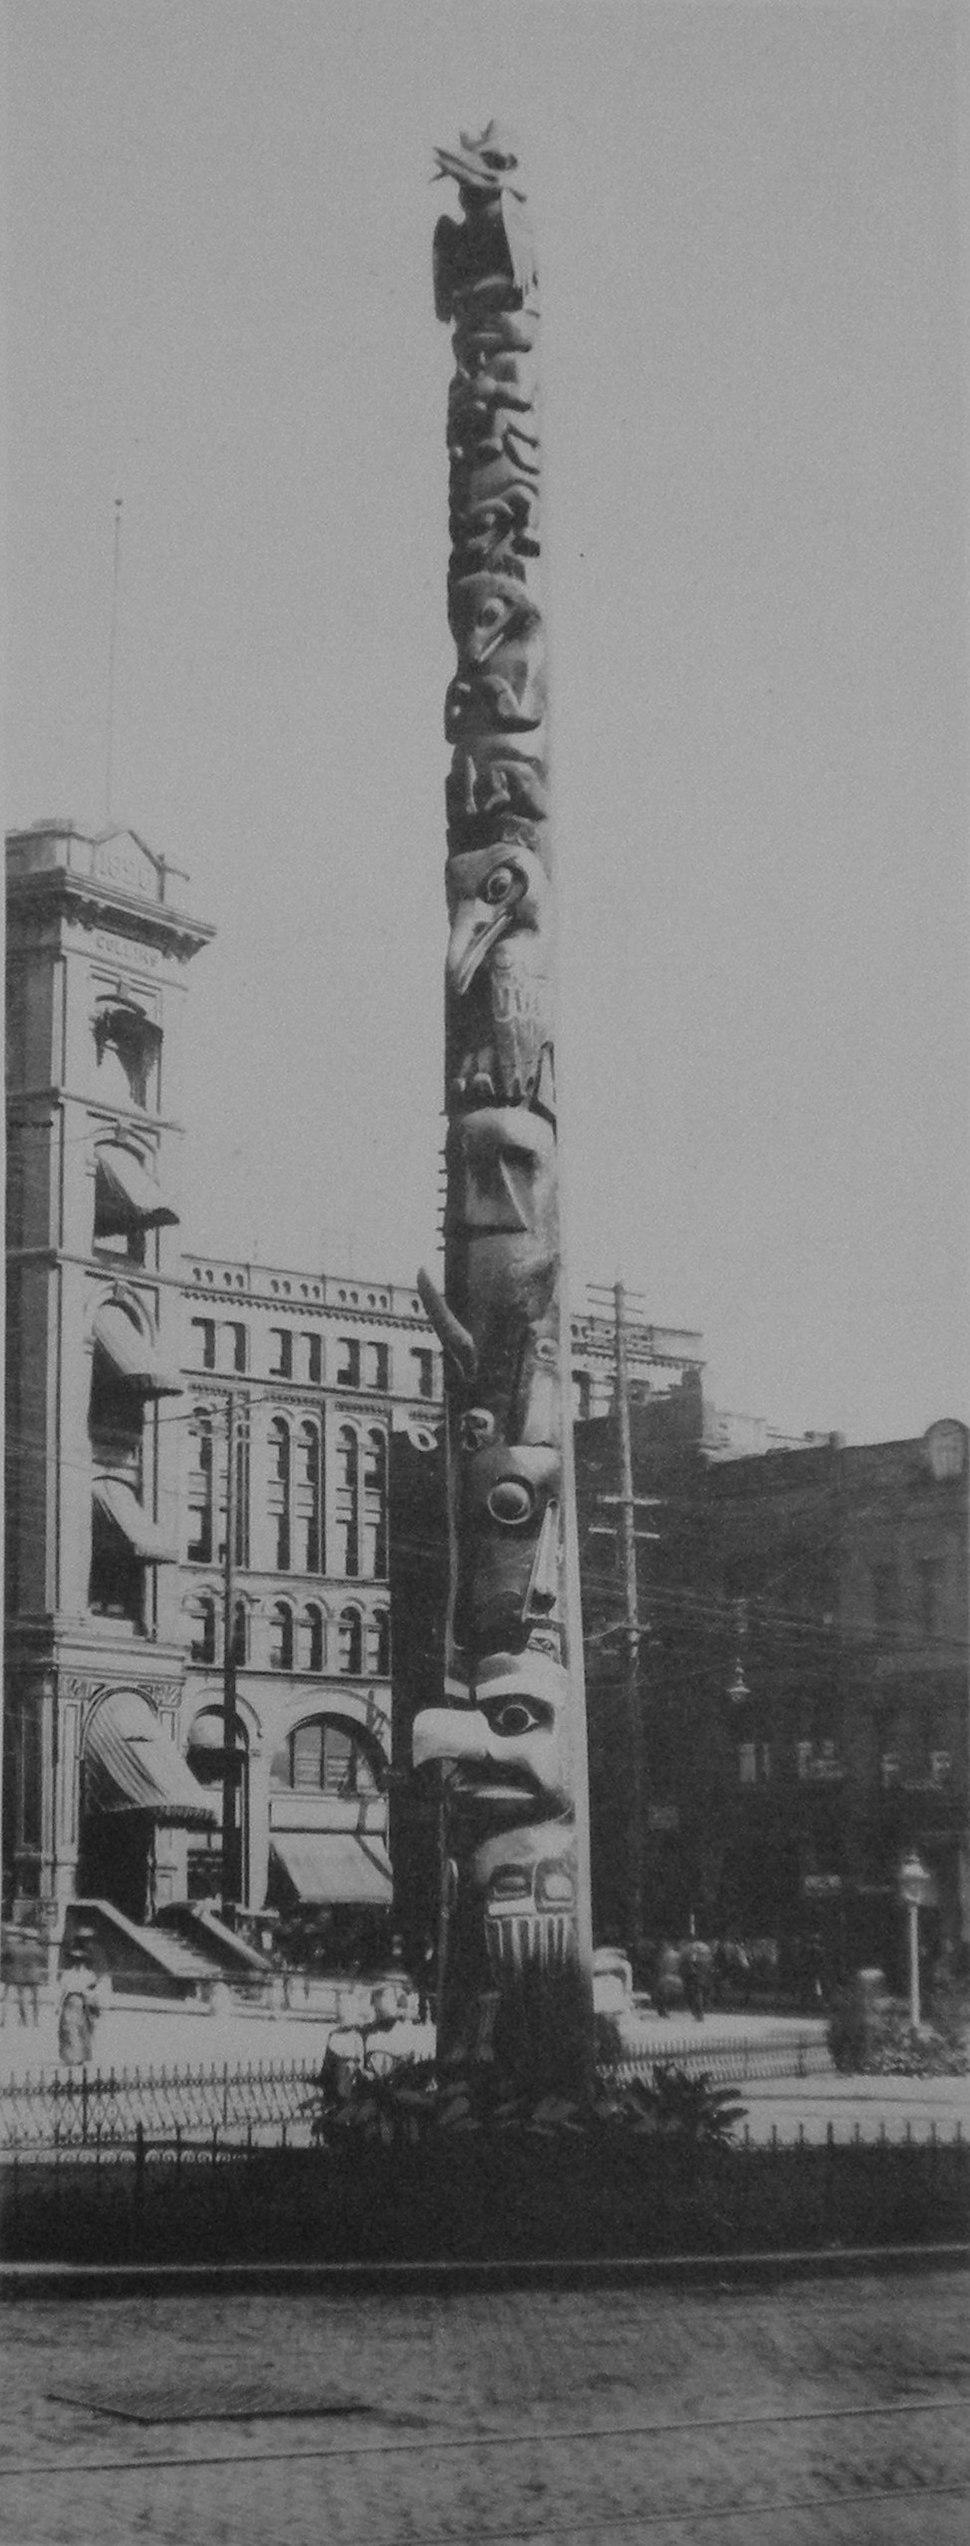 Totem Pole - Pioneer Square - 1907